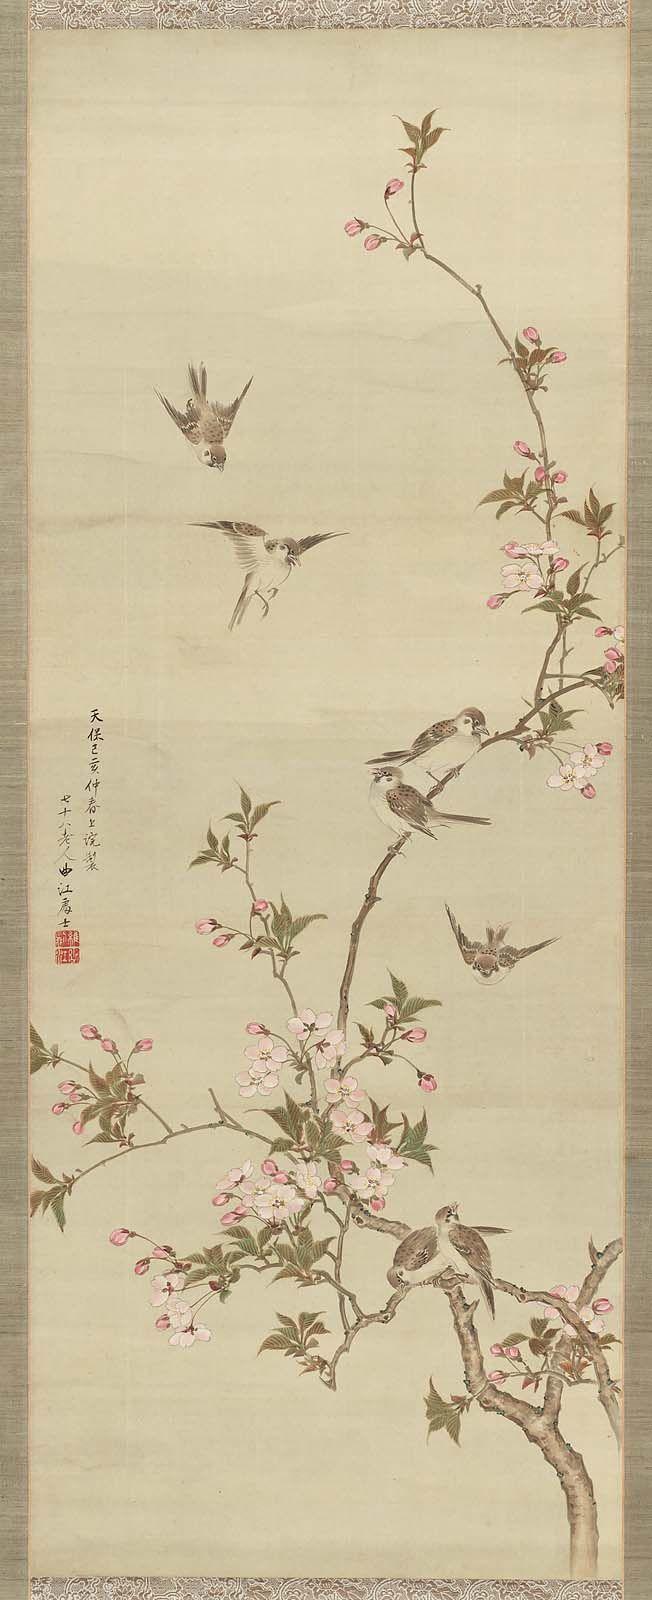 Sparrows and Cherry  1839 (Tenpô 10)  Koike Kyokukô, Japanese, dates unknown